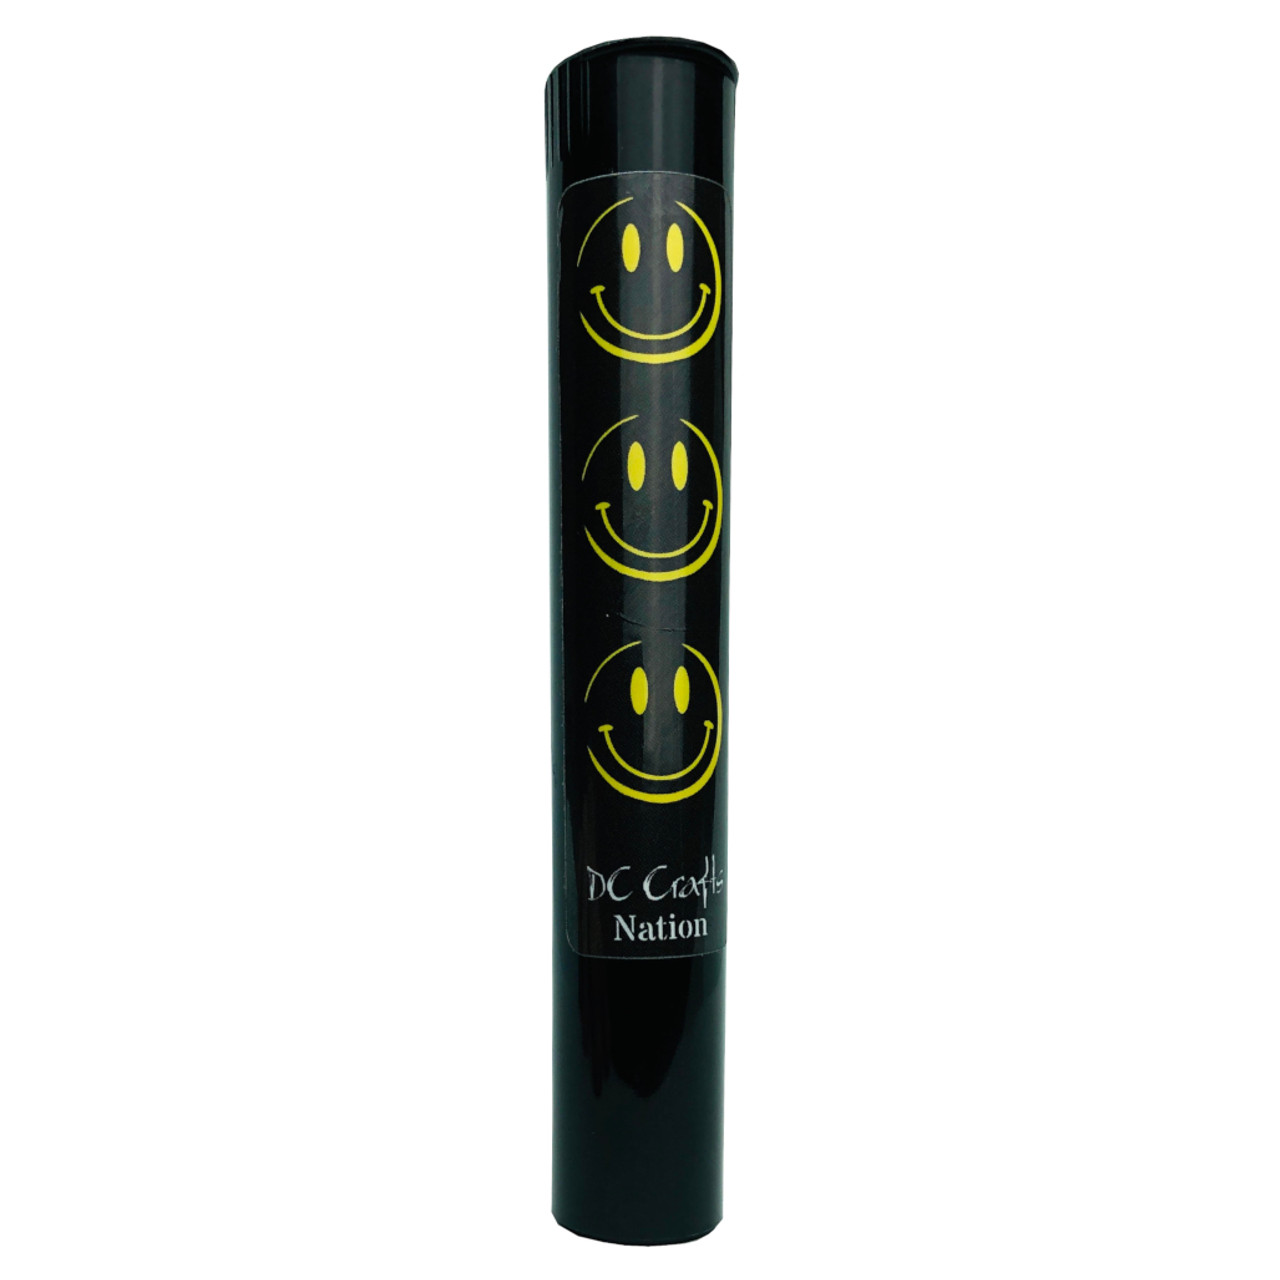 DC Crafts Nation Pocket Protector Herb Stash Child Resistant Tube Happy